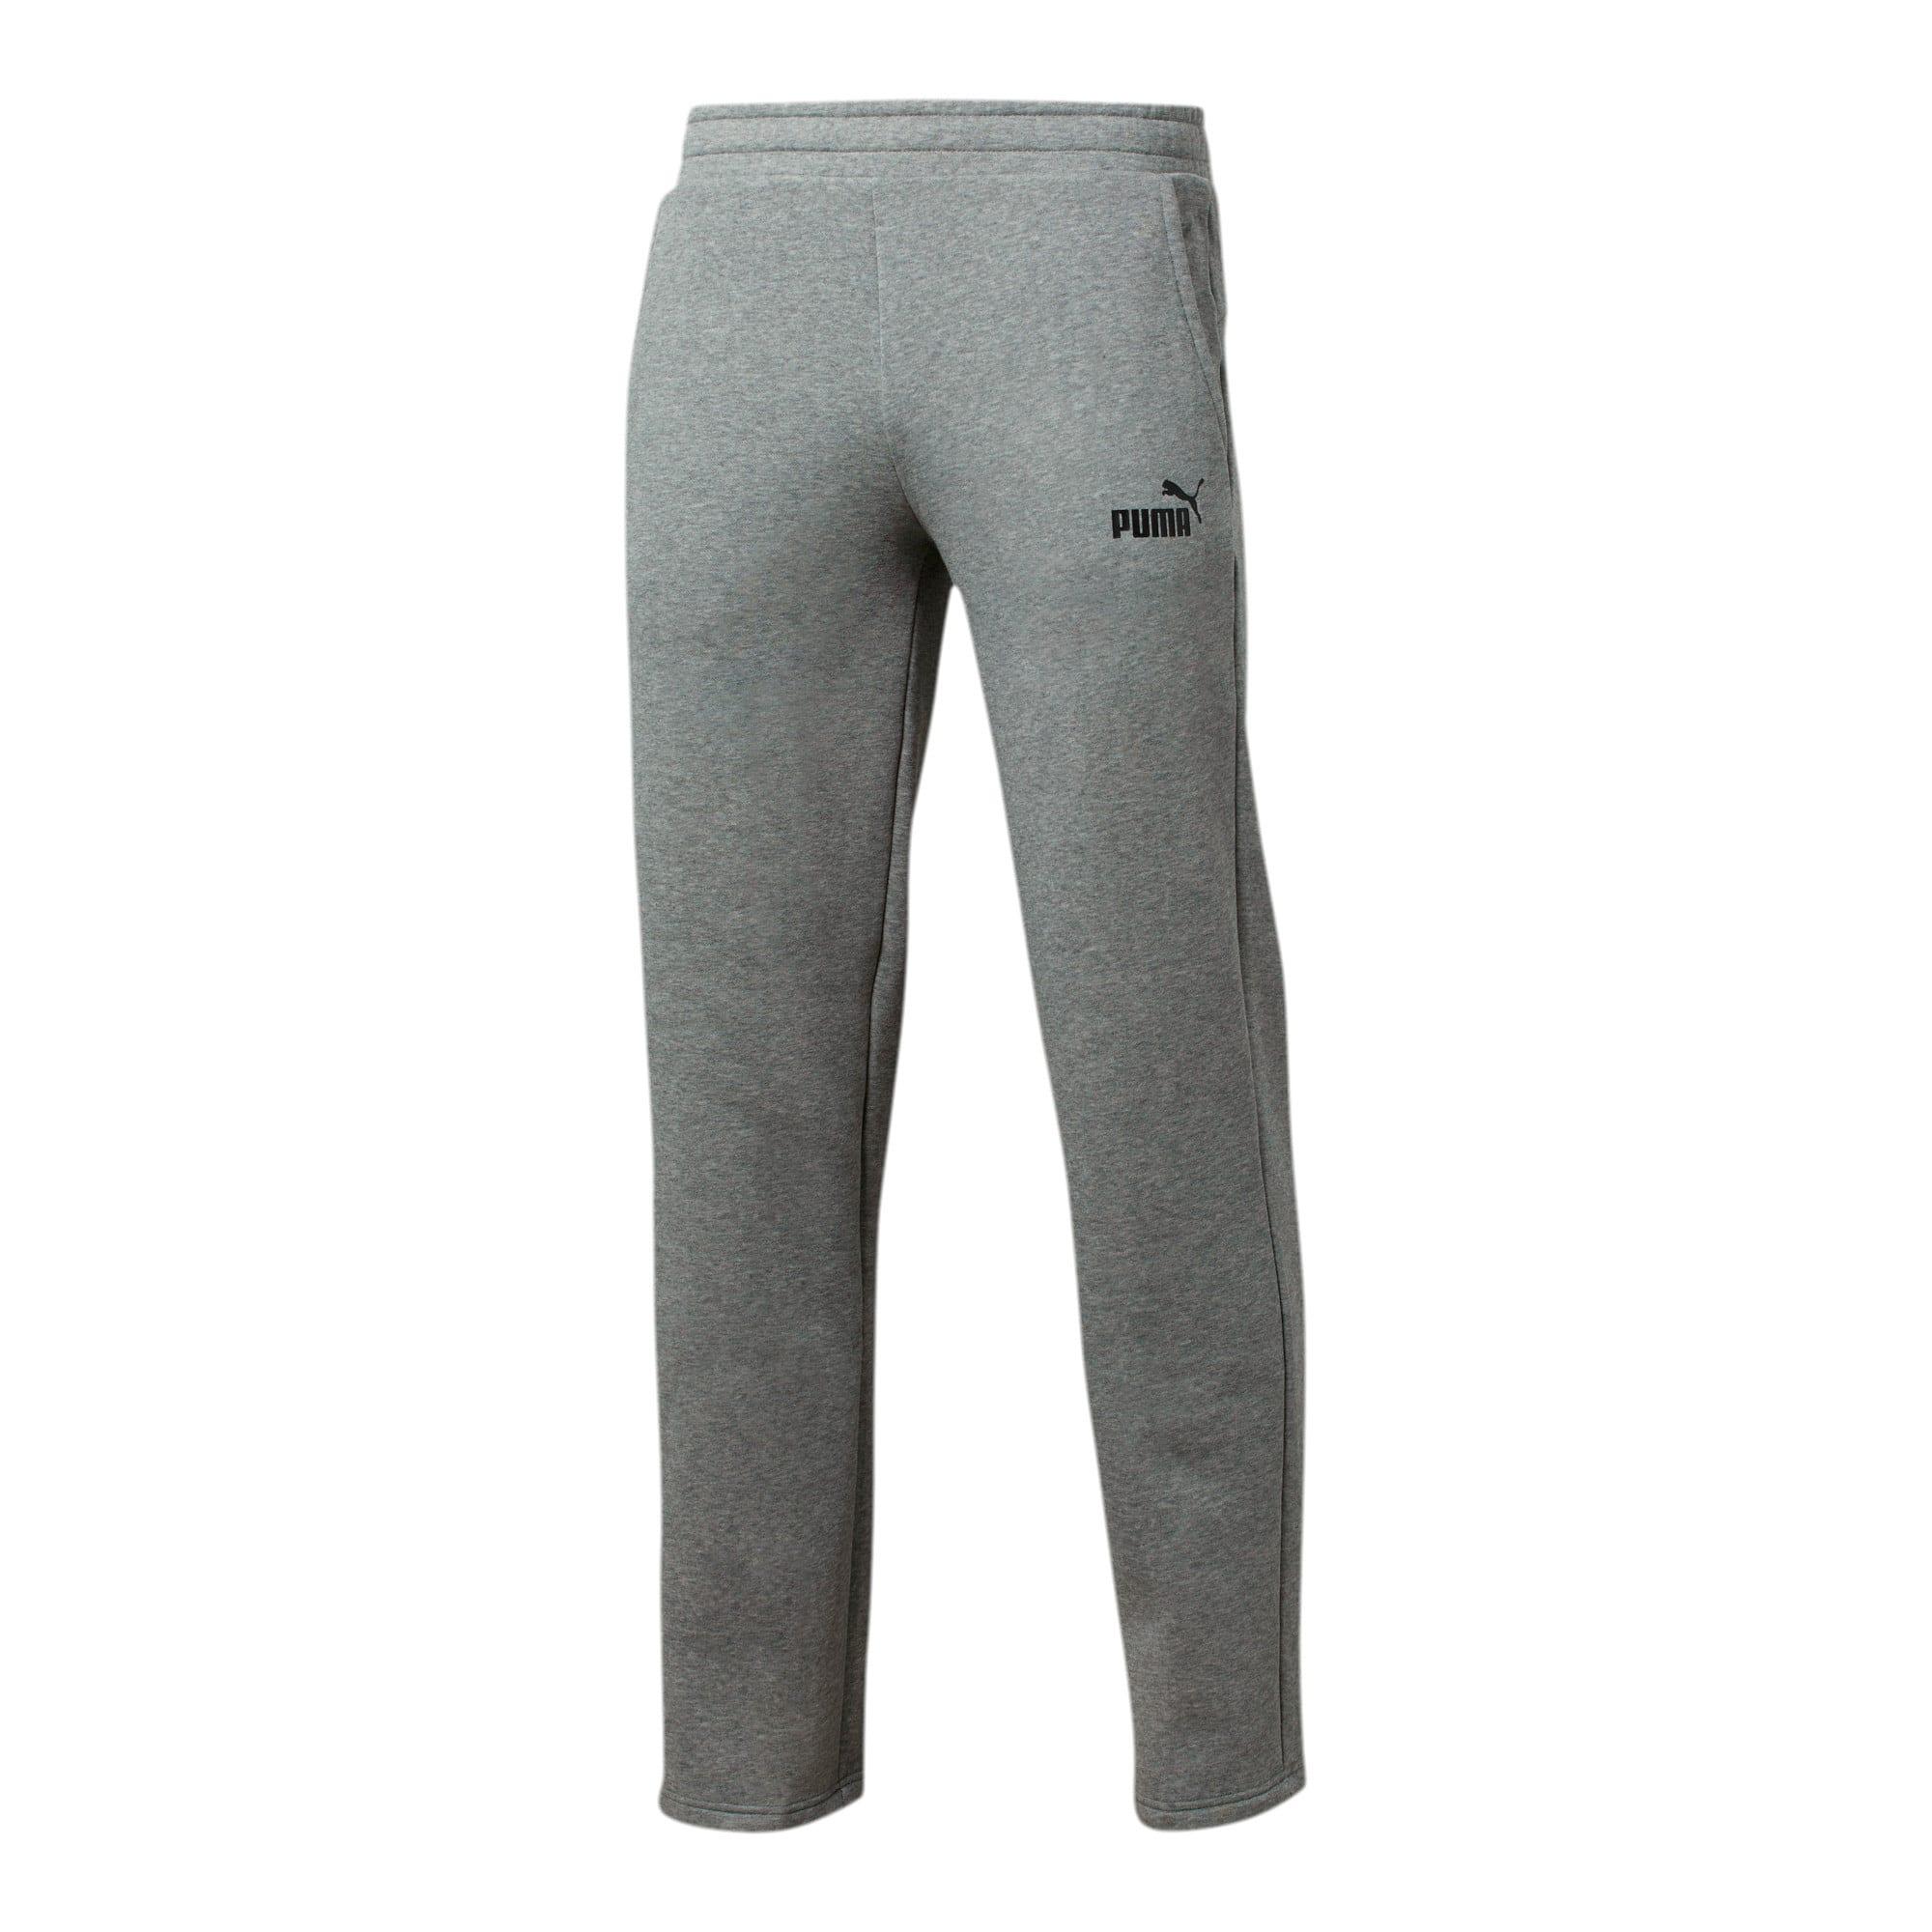 Thumbnail 1 of Essentials Men's Fleece Pants, Medium Gray Heather, medium